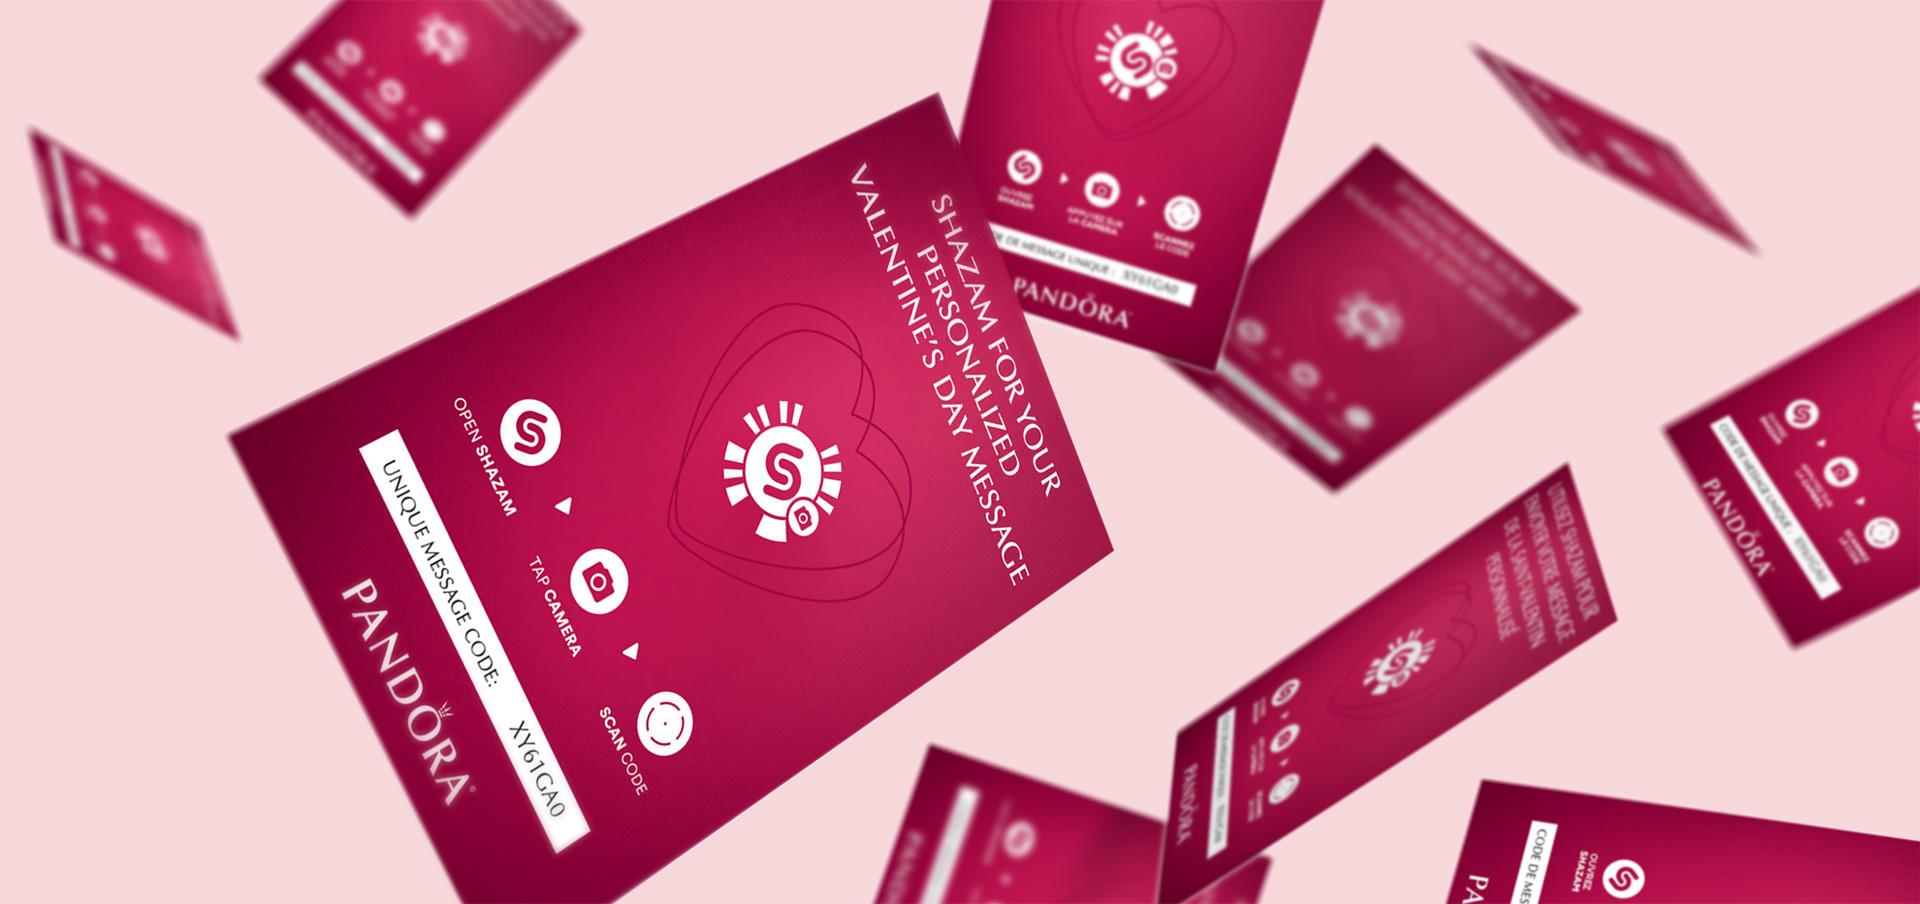 Pandora promo cards